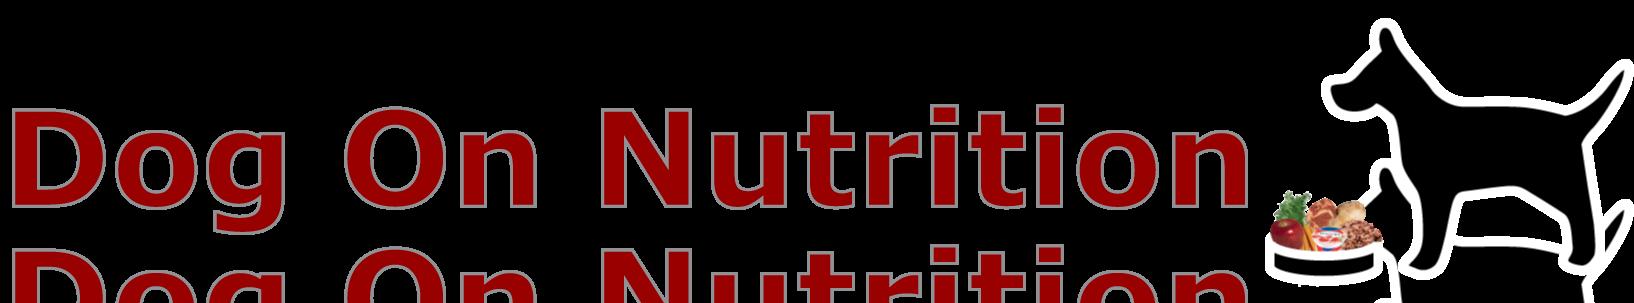 Dog On Nutrition